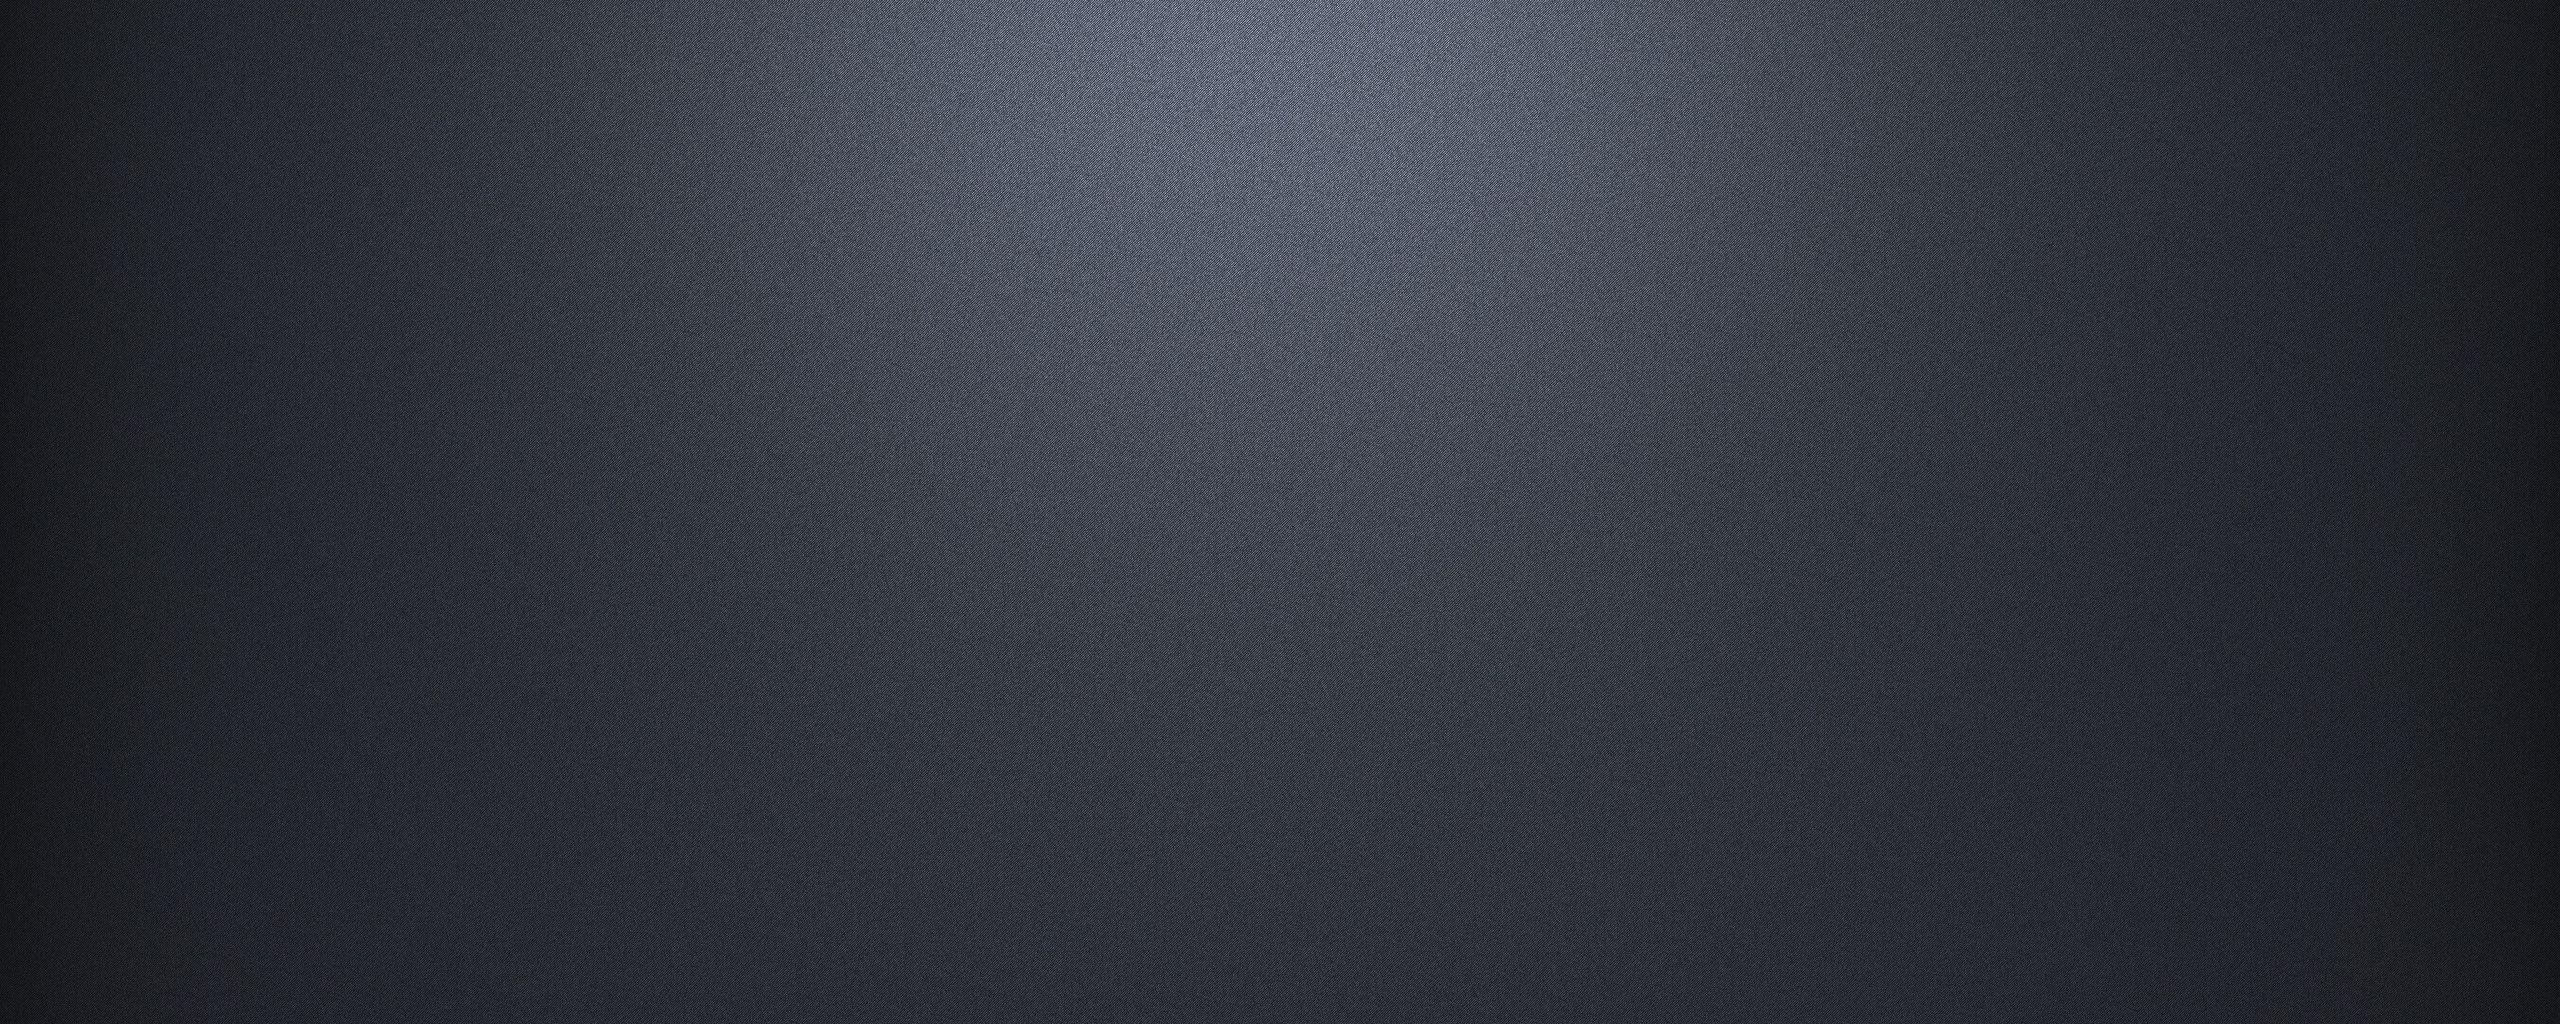 Dark Grey Wallpaper 07 - [2560x1024]